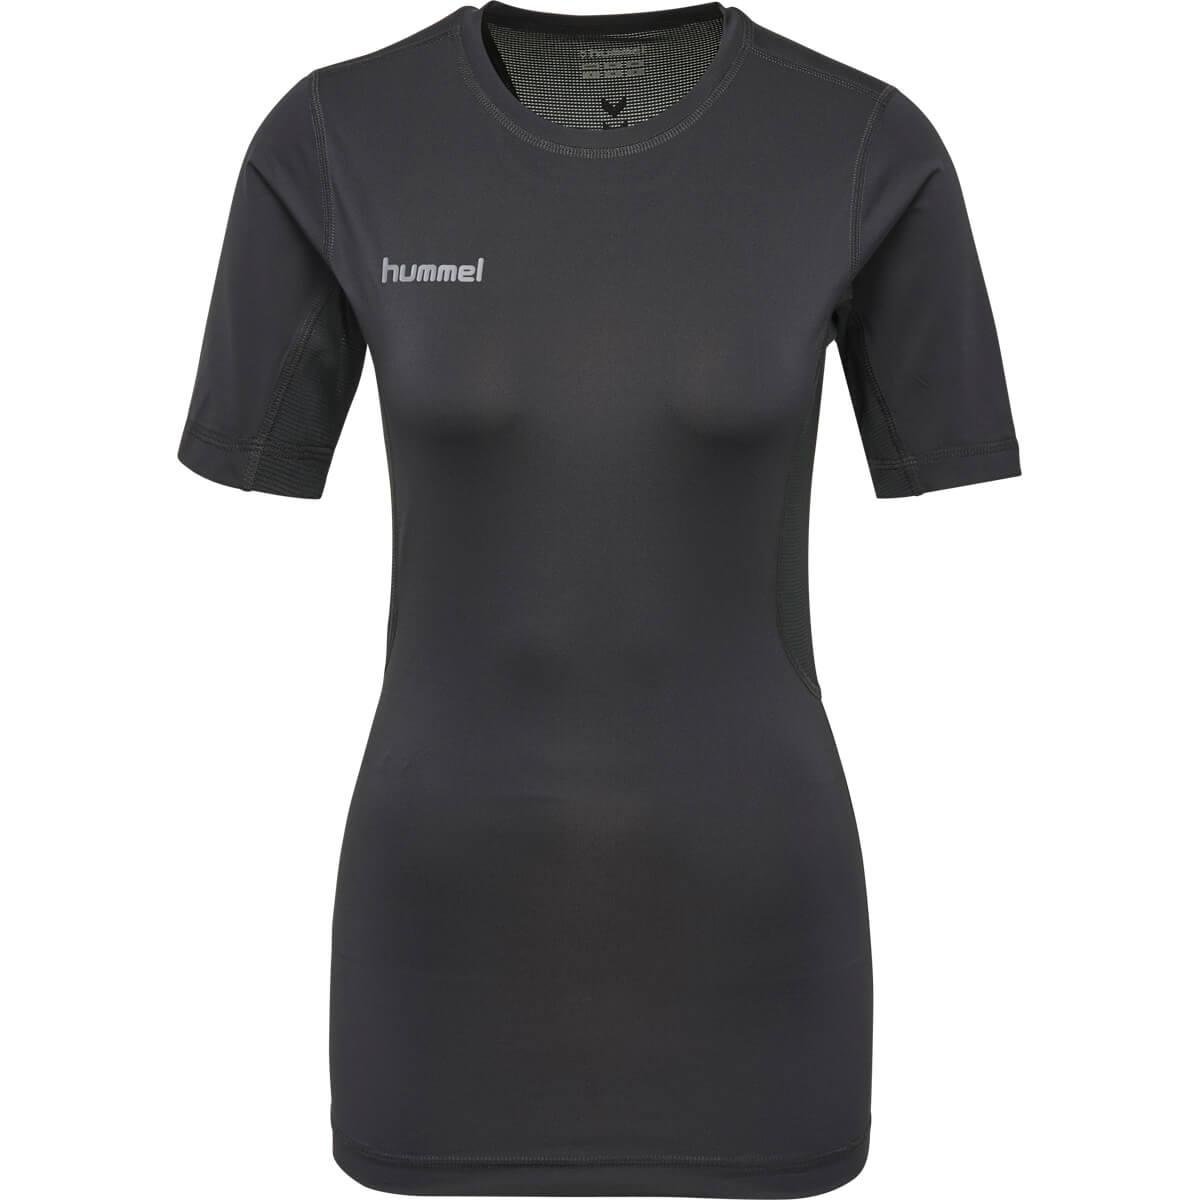 hummel First Performance Trænings T-shirt Dame